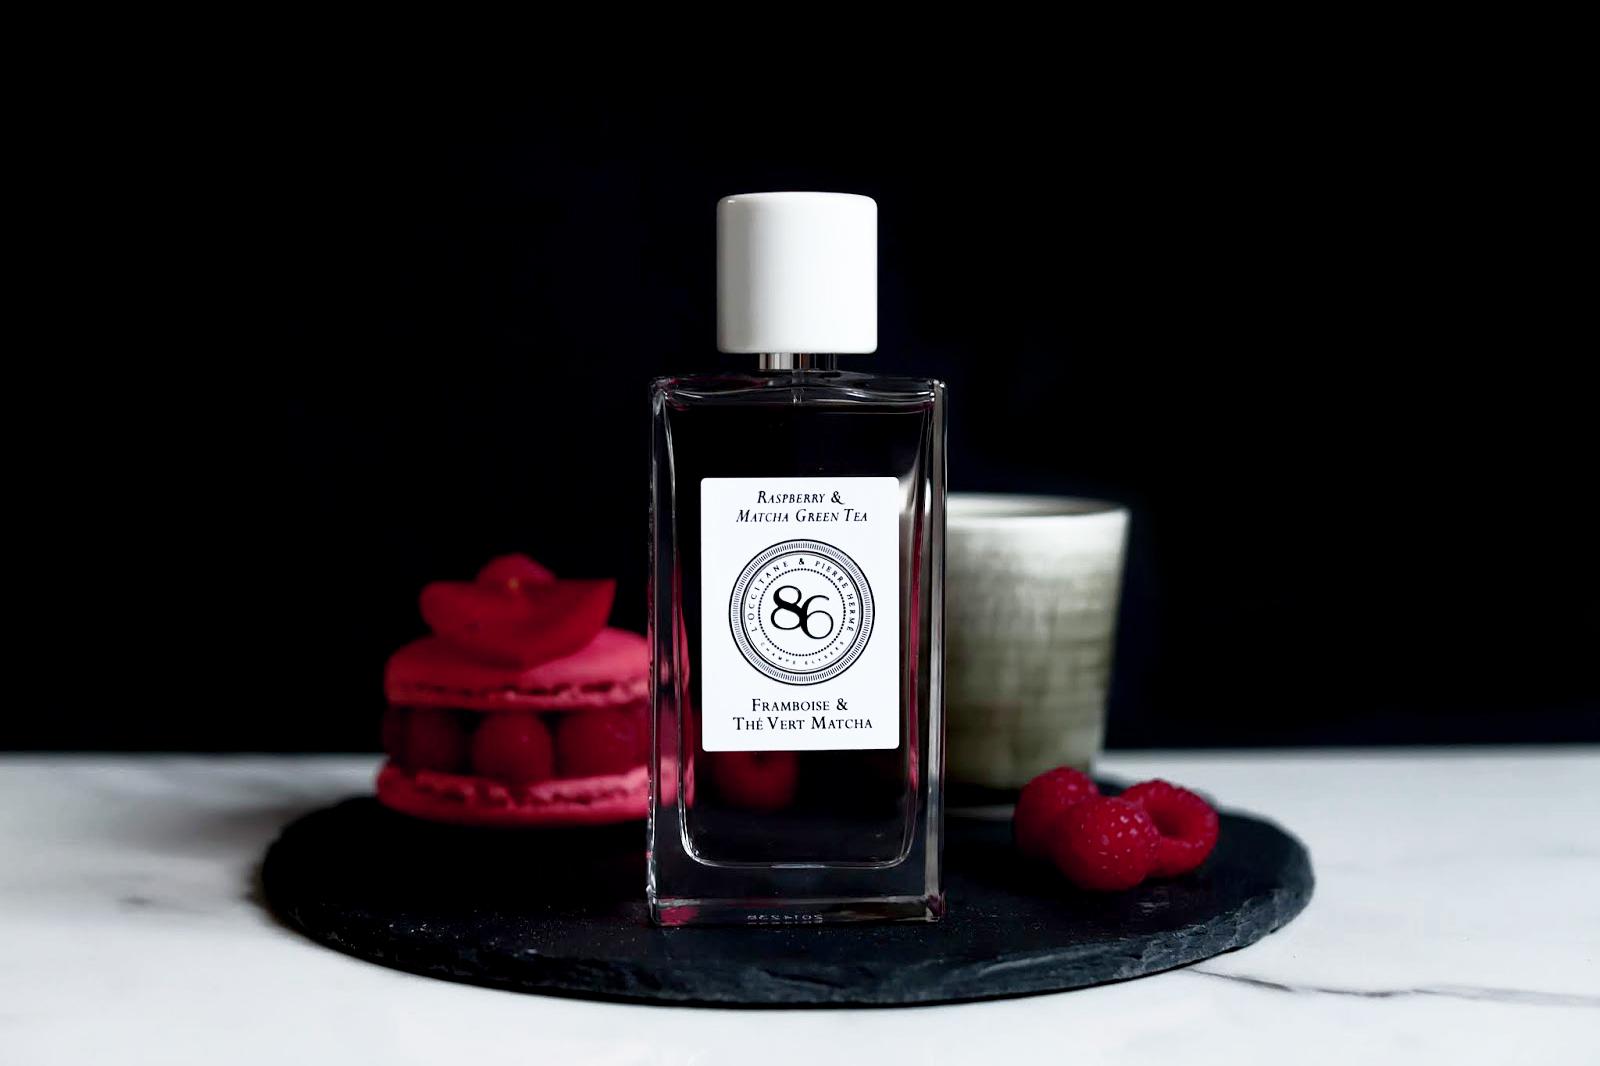 pierre herme l'occitane 86 champs parfums framboise thé vert matcha avis test